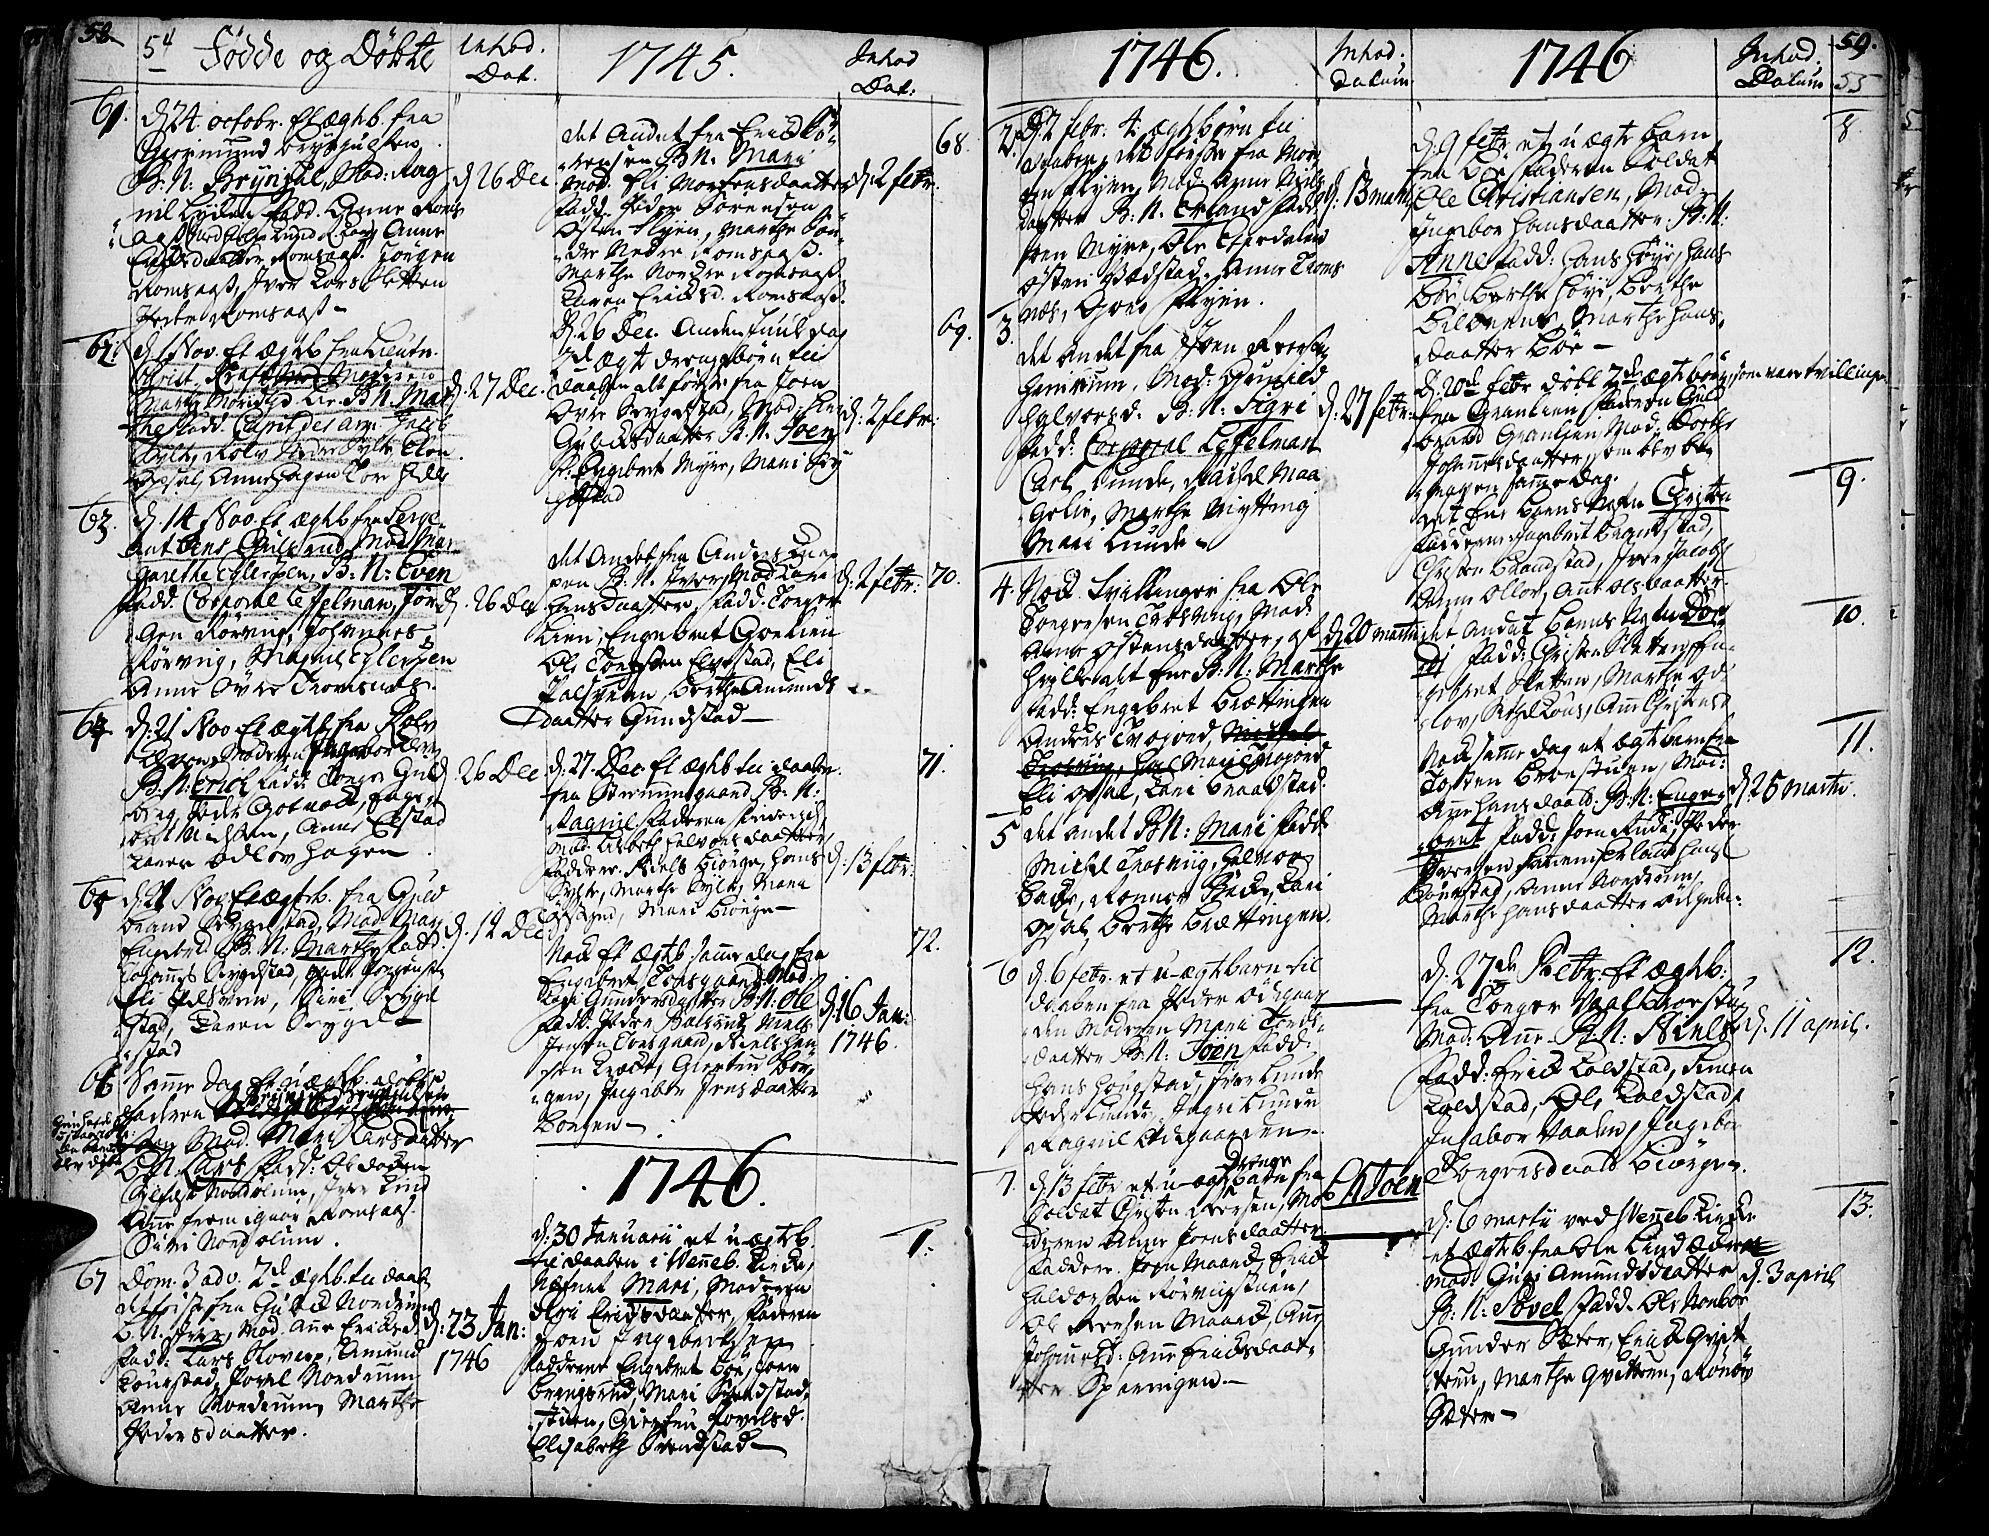 SAH, Ringebu prestekontor, Ministerialbok nr. 2, 1734-1780, s. 54-55